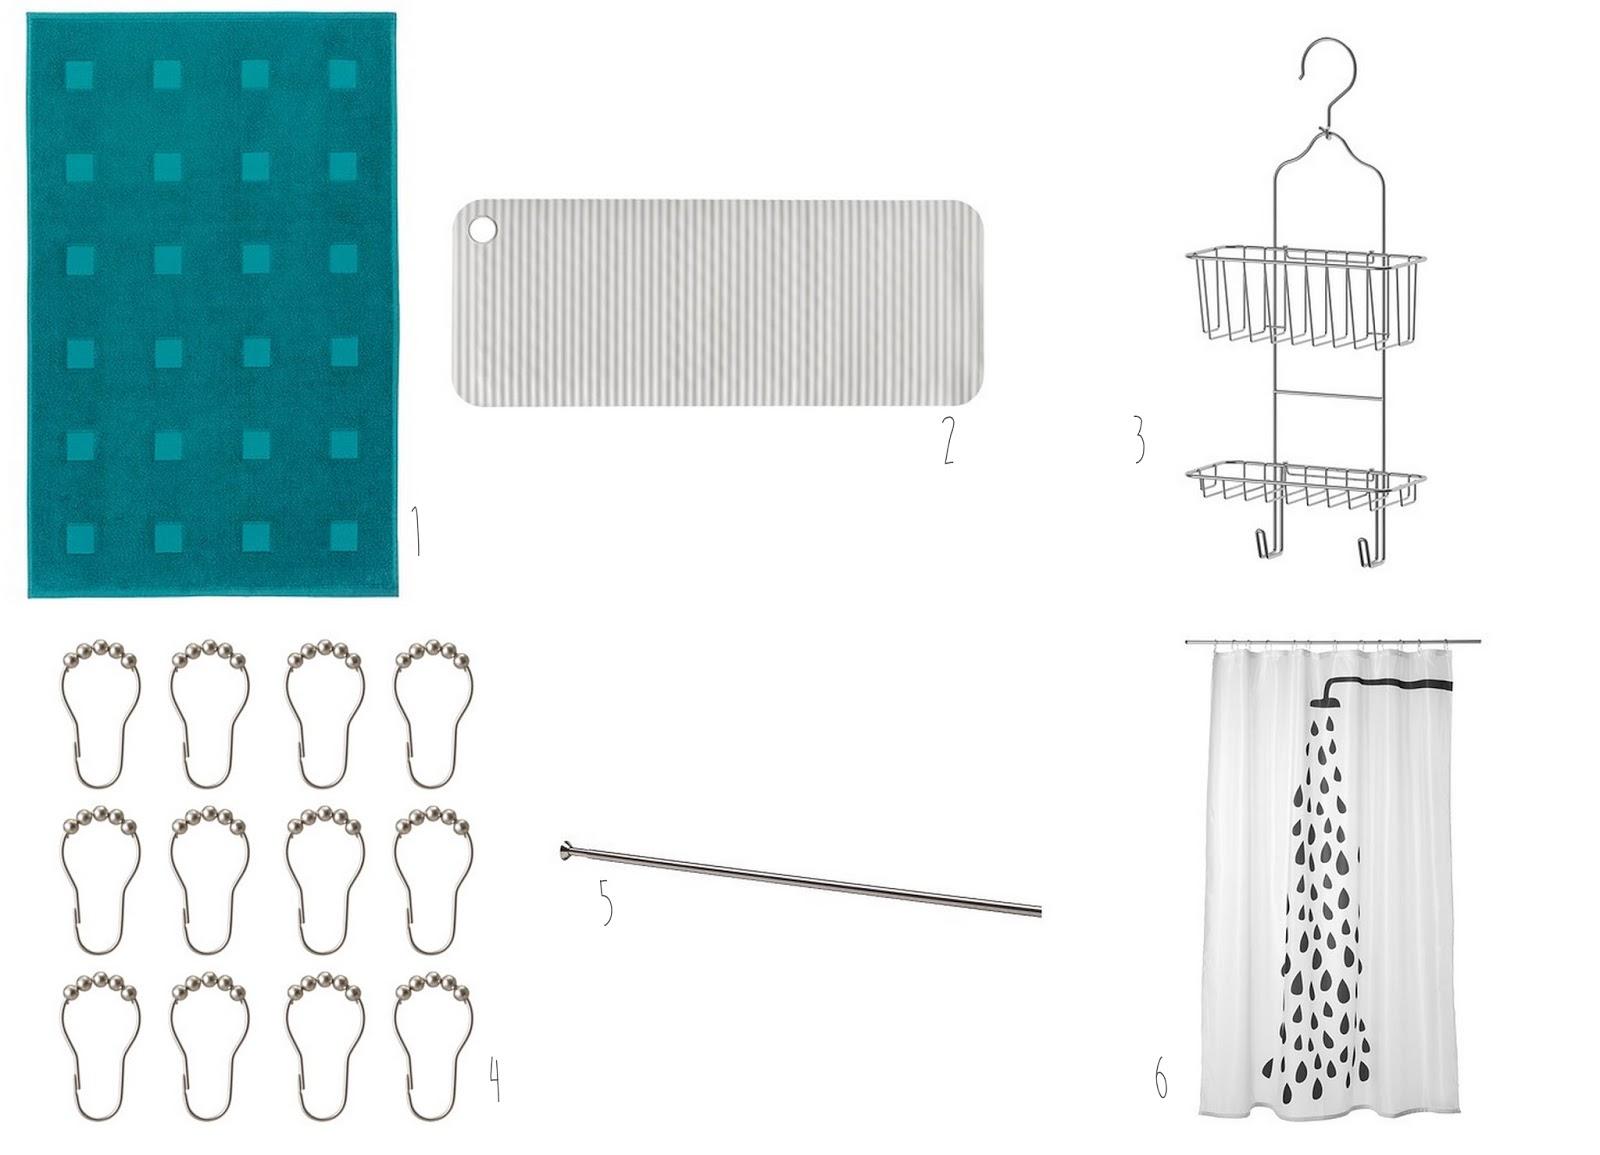 Guia Ikea Para Imigrantes O Banheiro Like A New Home Blog